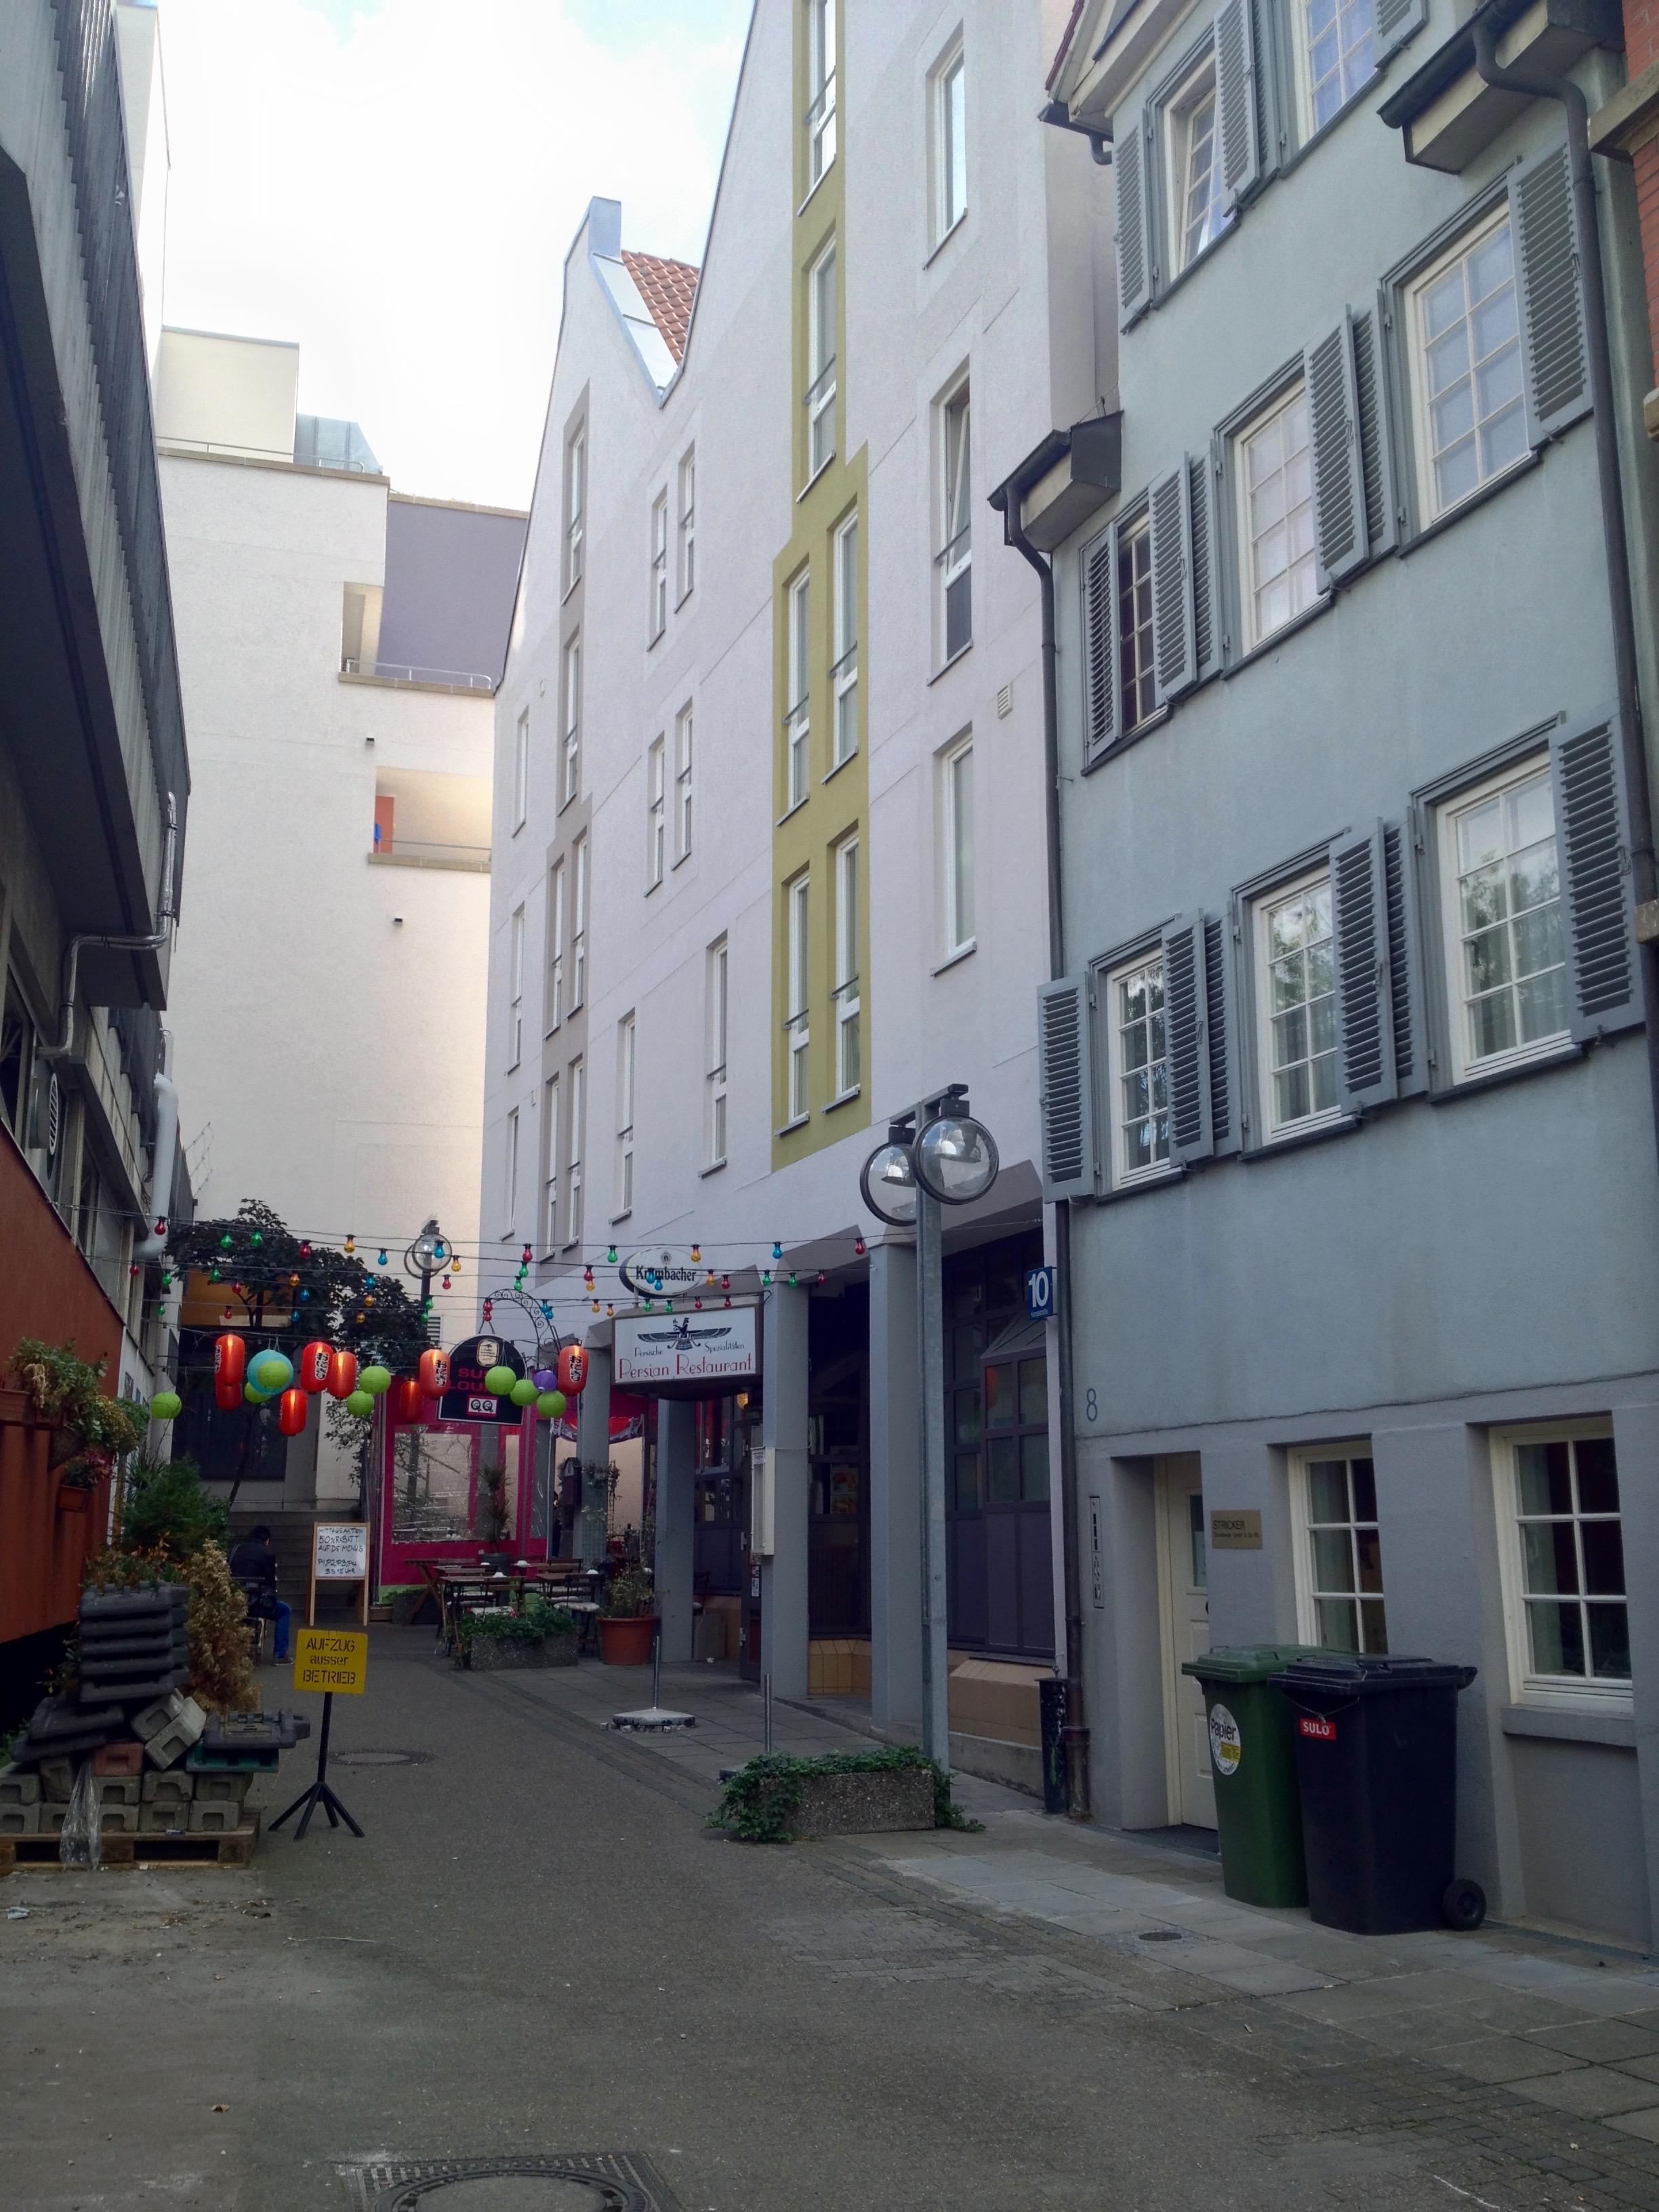 The Persian Restaurant's nondescript location on  Kanalstraße